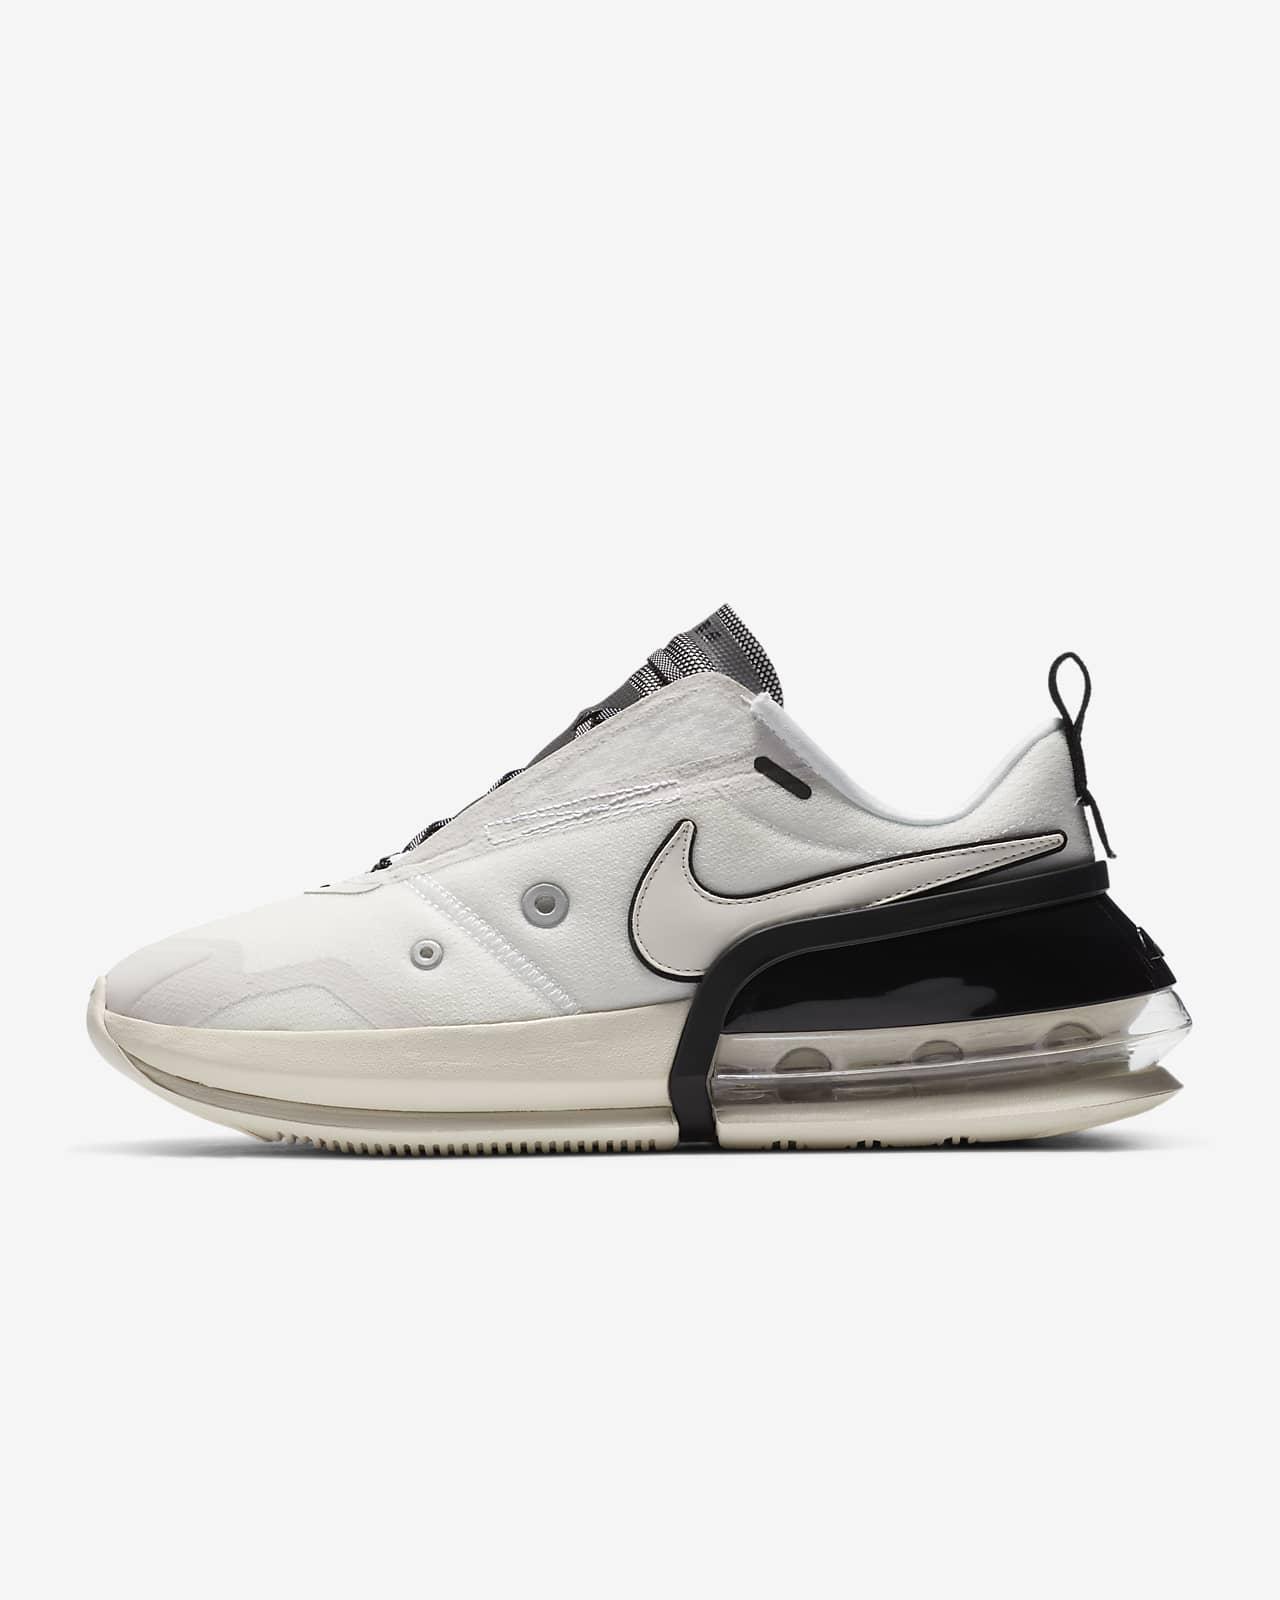 Nike Air Max Up Women's Shoe